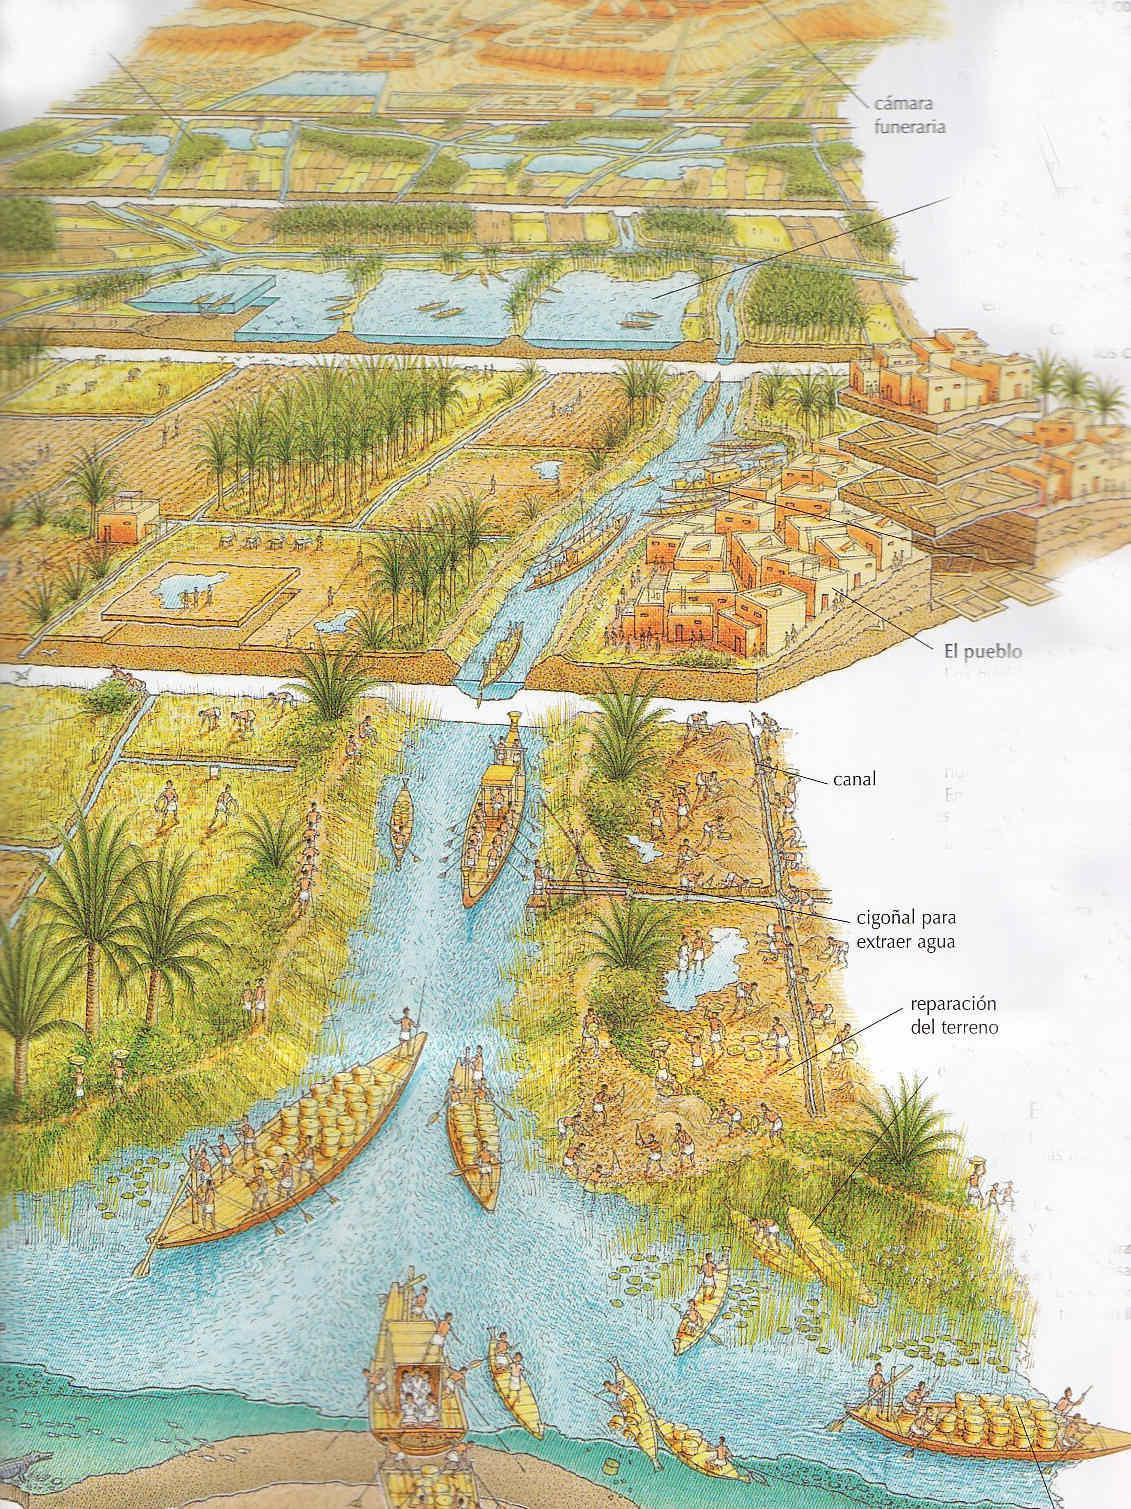 Egipto antiguo 26 y Ptolomeo III Evergetes 2